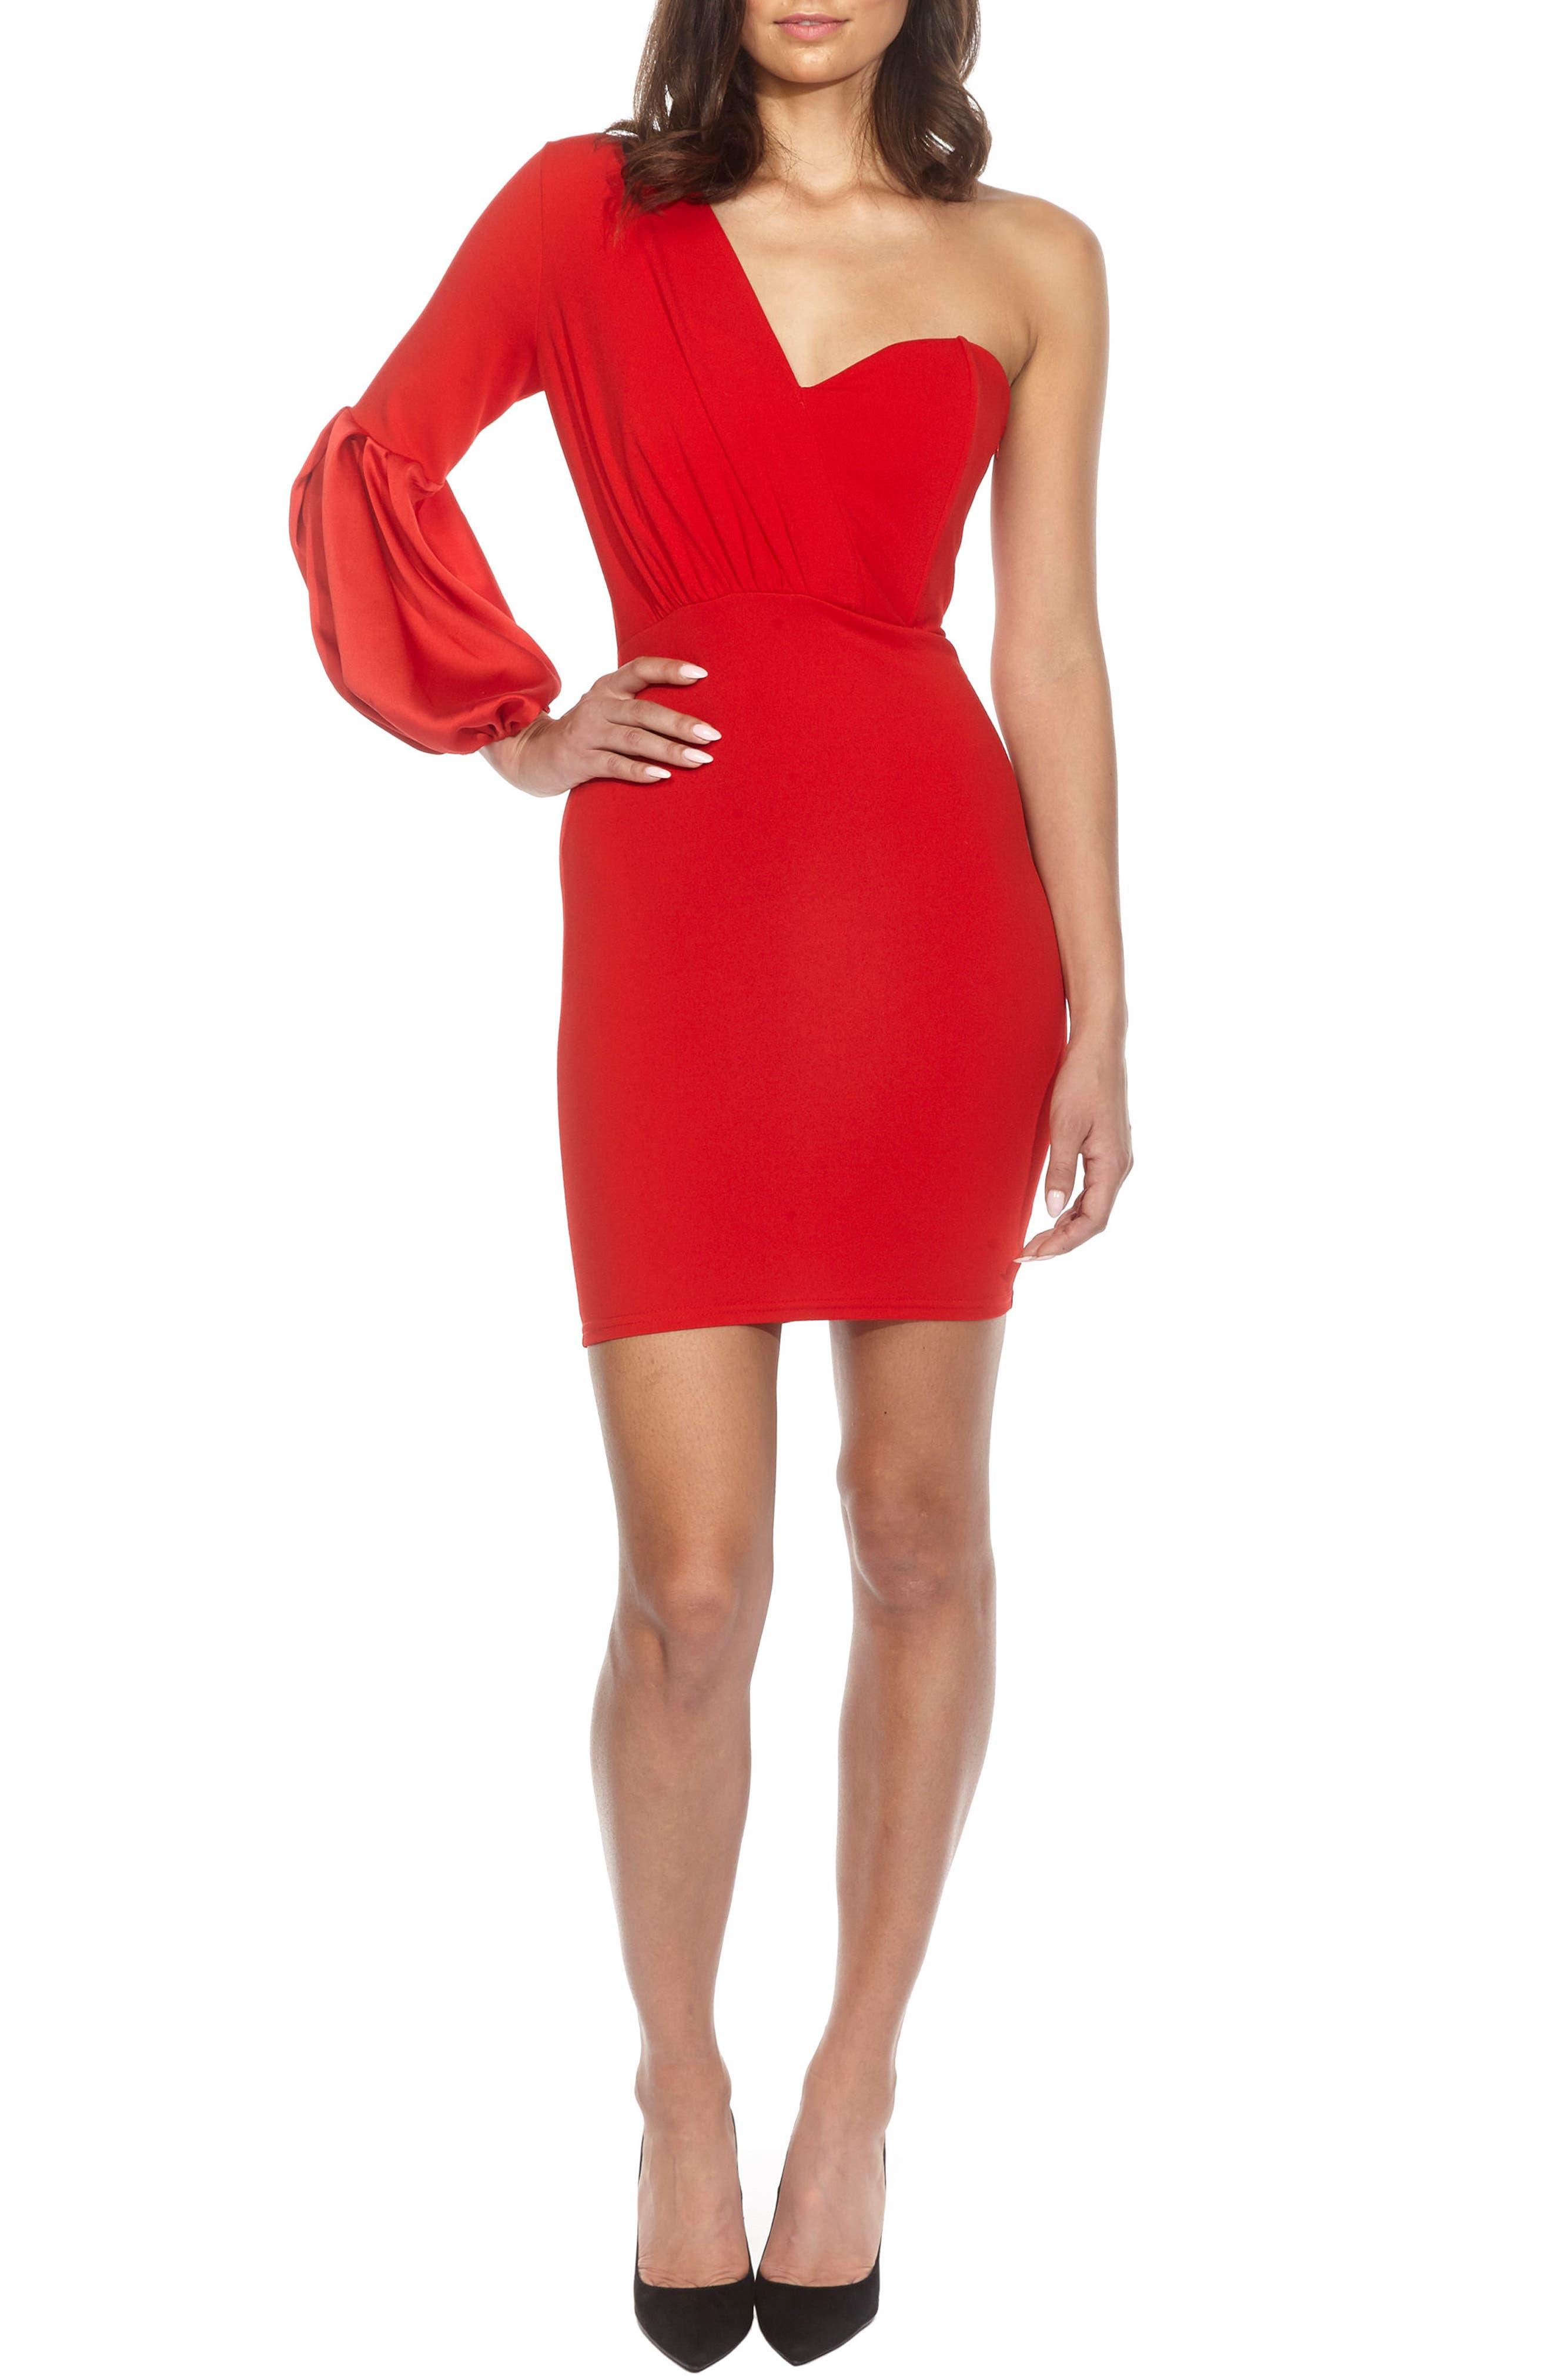 Naeva One-Shoulder Minidress,                         Main,                         color, Red